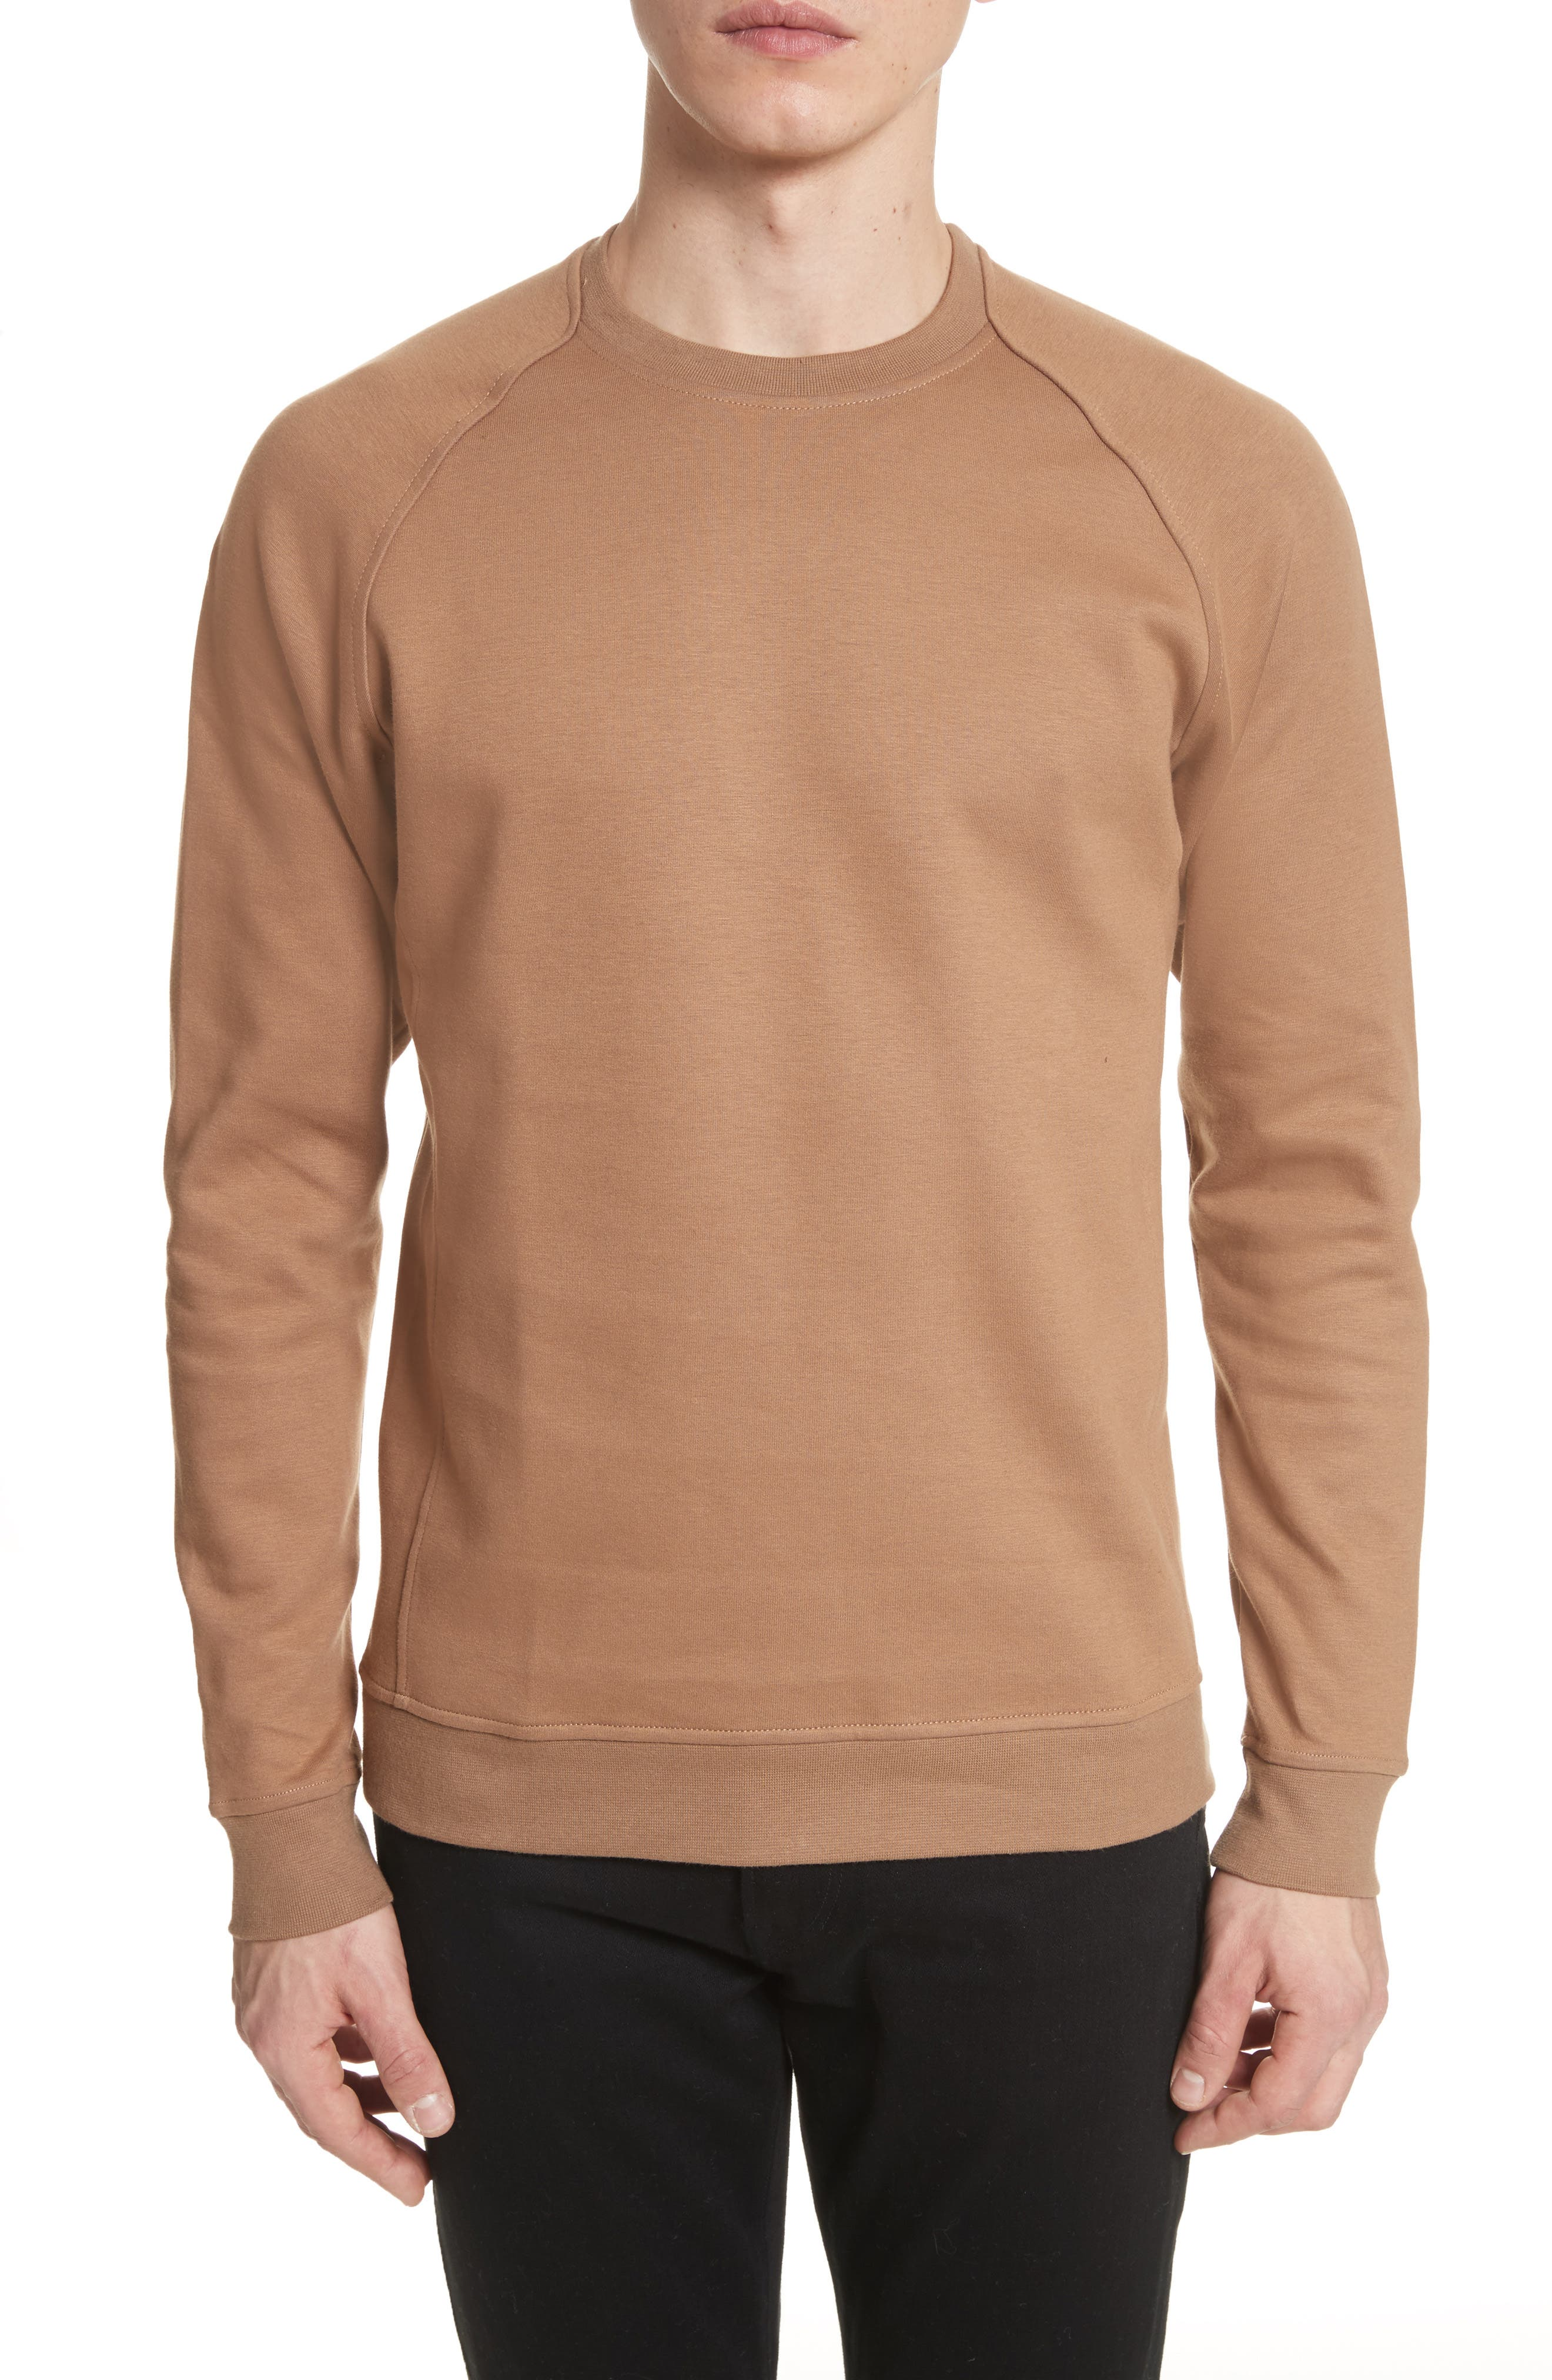 Ketel Dry Mercerized Crewneck Sweatshirt,                         Main,                         color, Light Sand